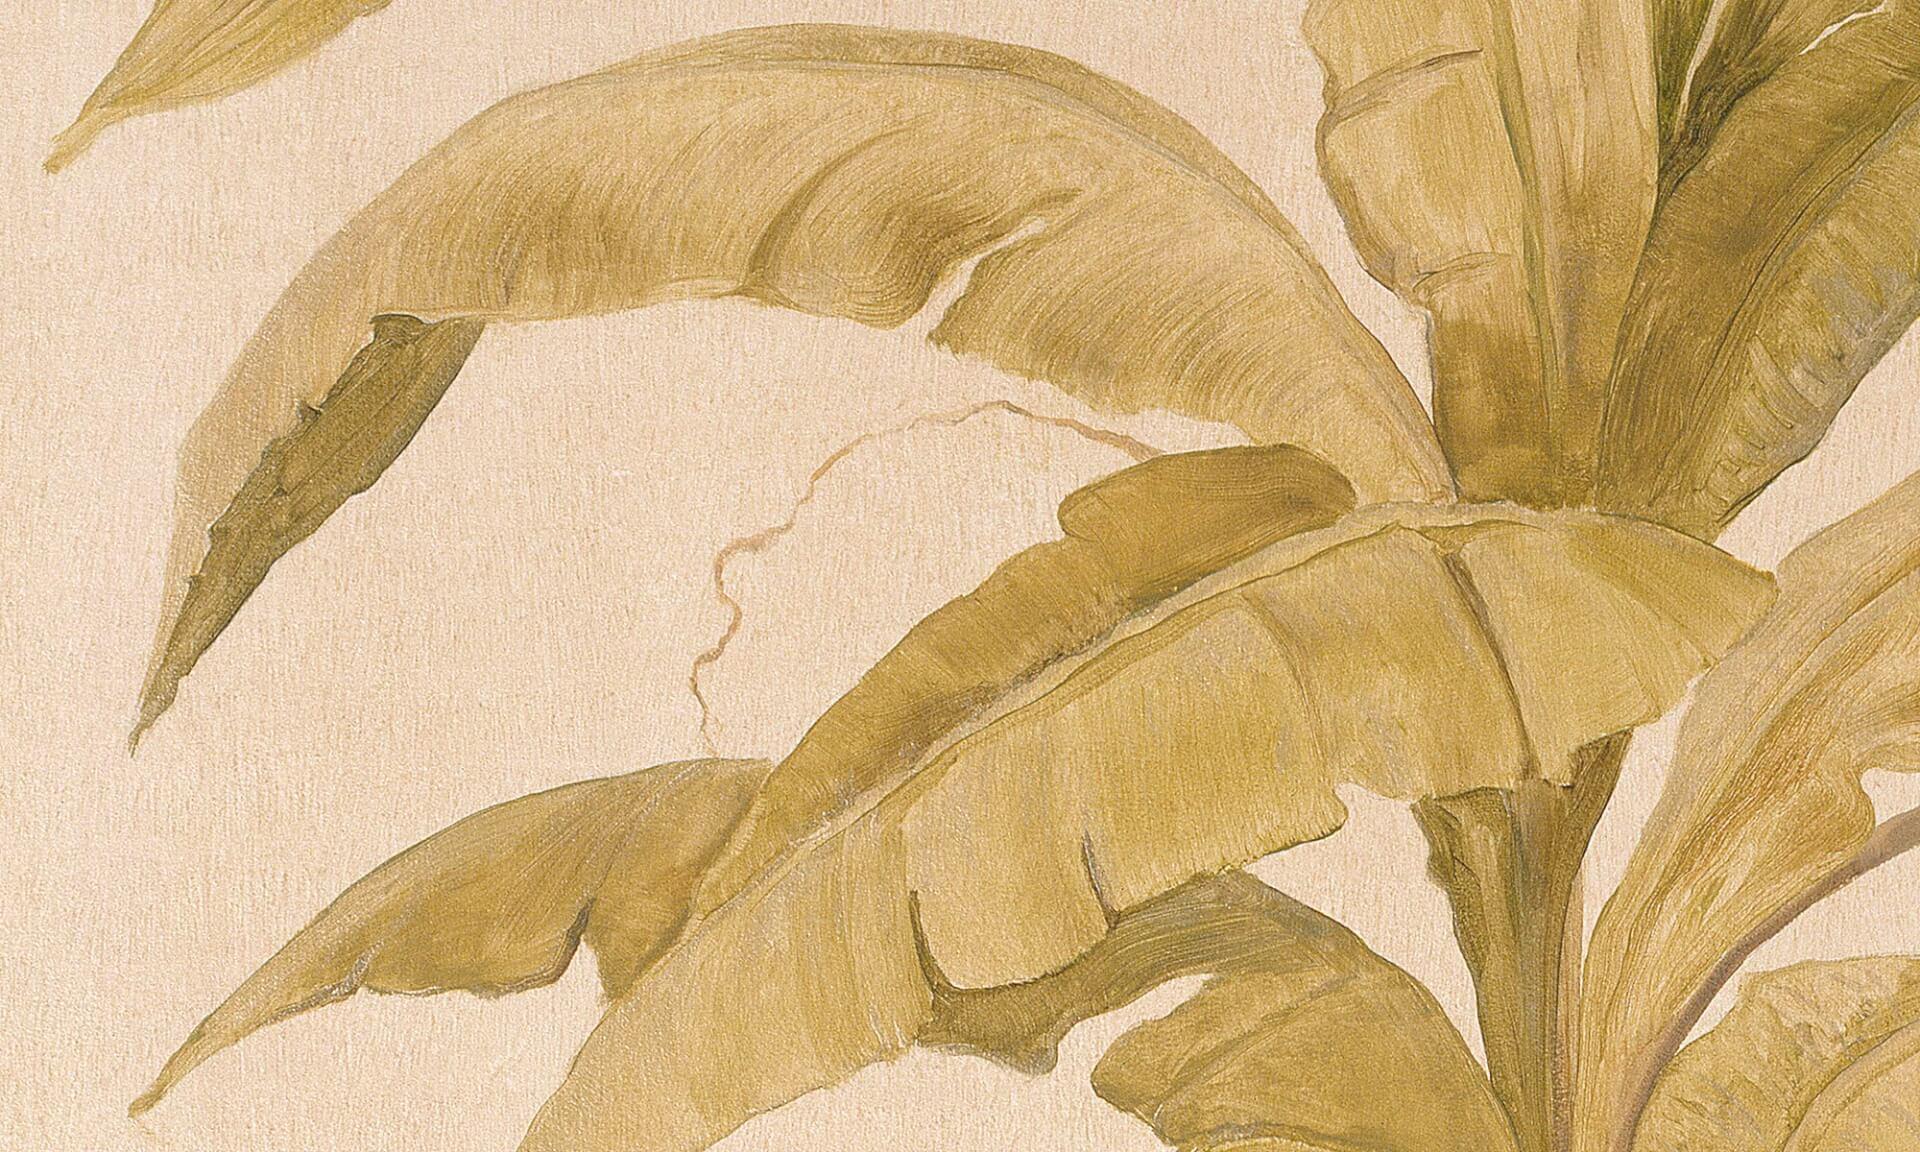 Date Palm 003 Lena Fransioli Mural